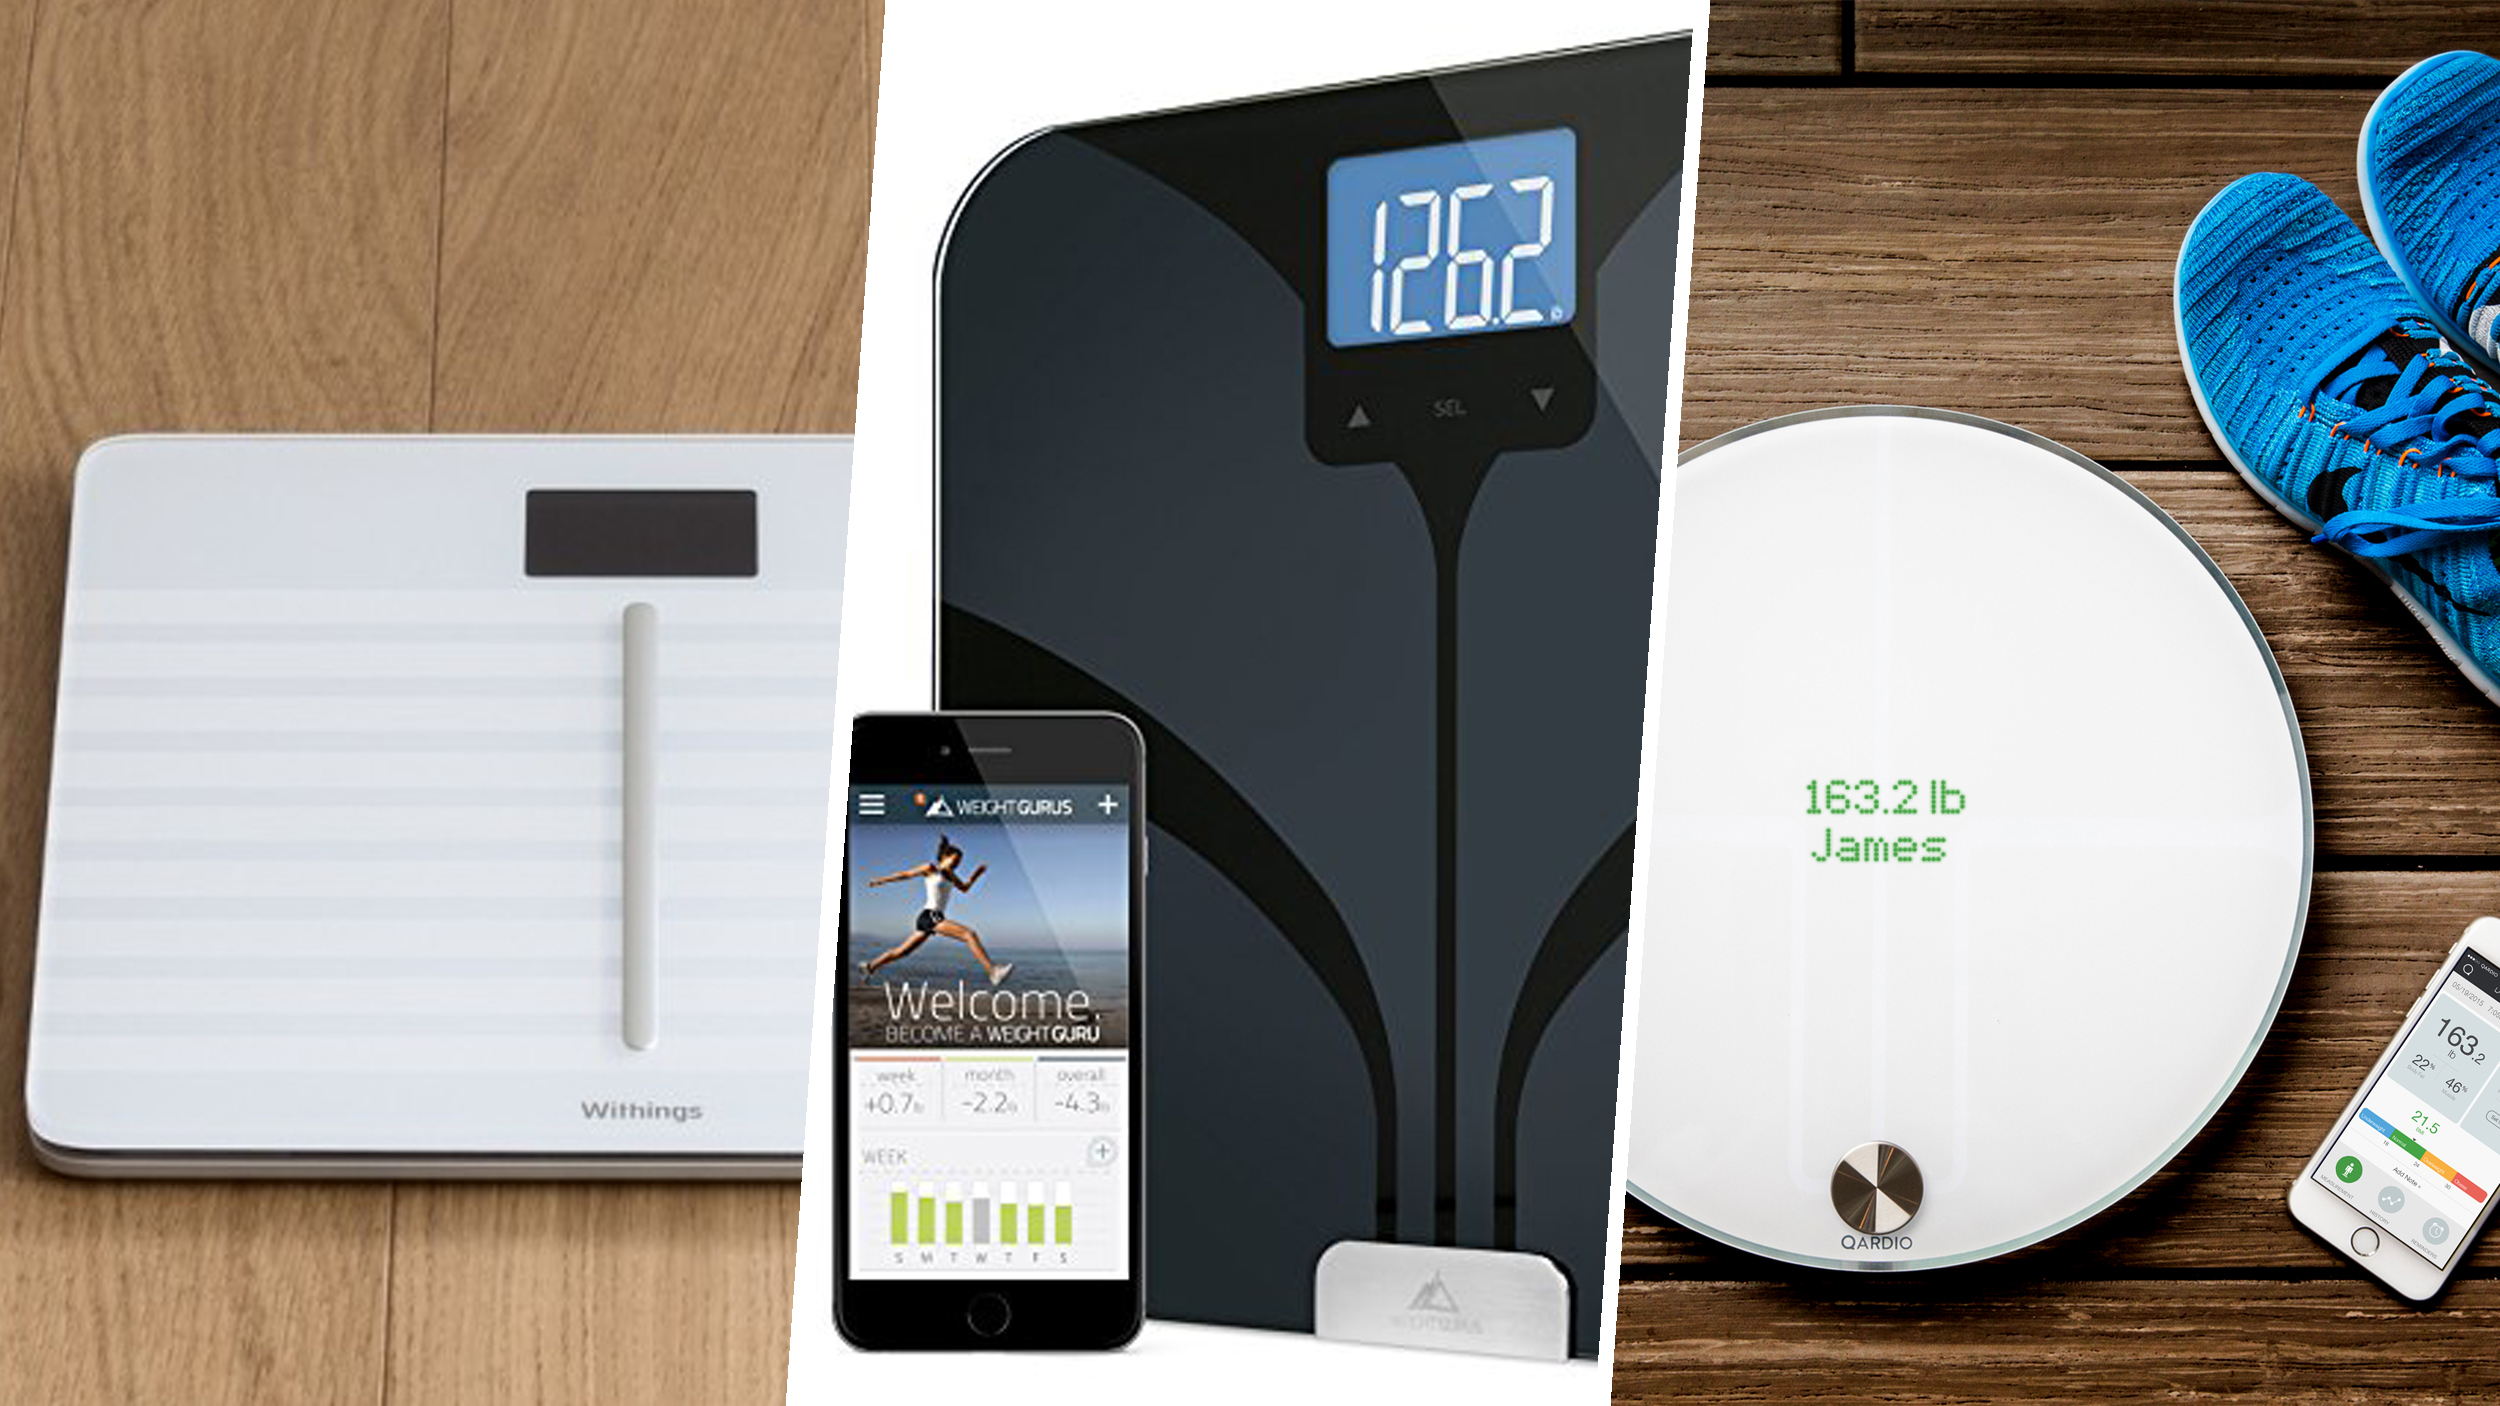 High Tech Bathroom Best Digital Bathroom Scales For Weight Loss 2017 Todaycom